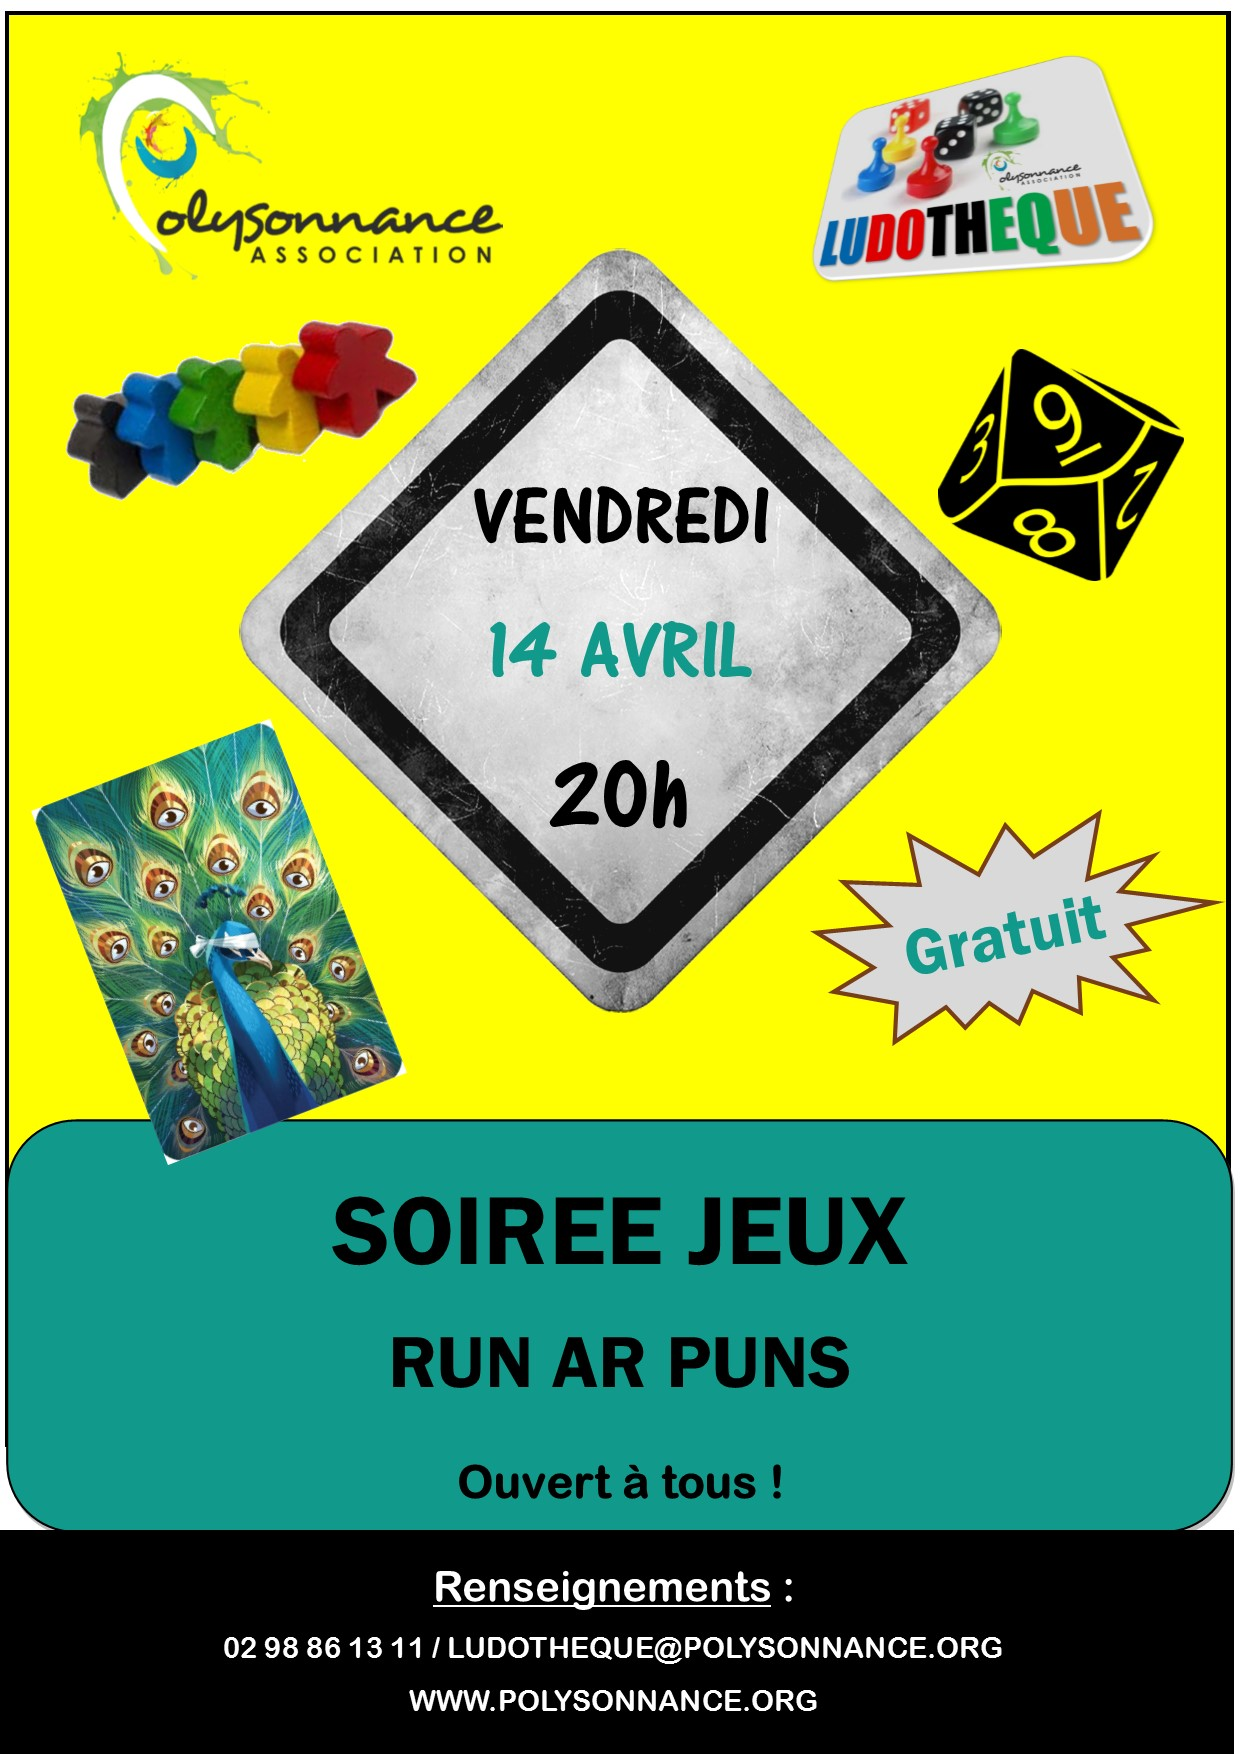 SOIREE JEUX : PROCHAINE DATE  : VENDREDI 14 AVRIL A 20H AU RUN AR PUNS